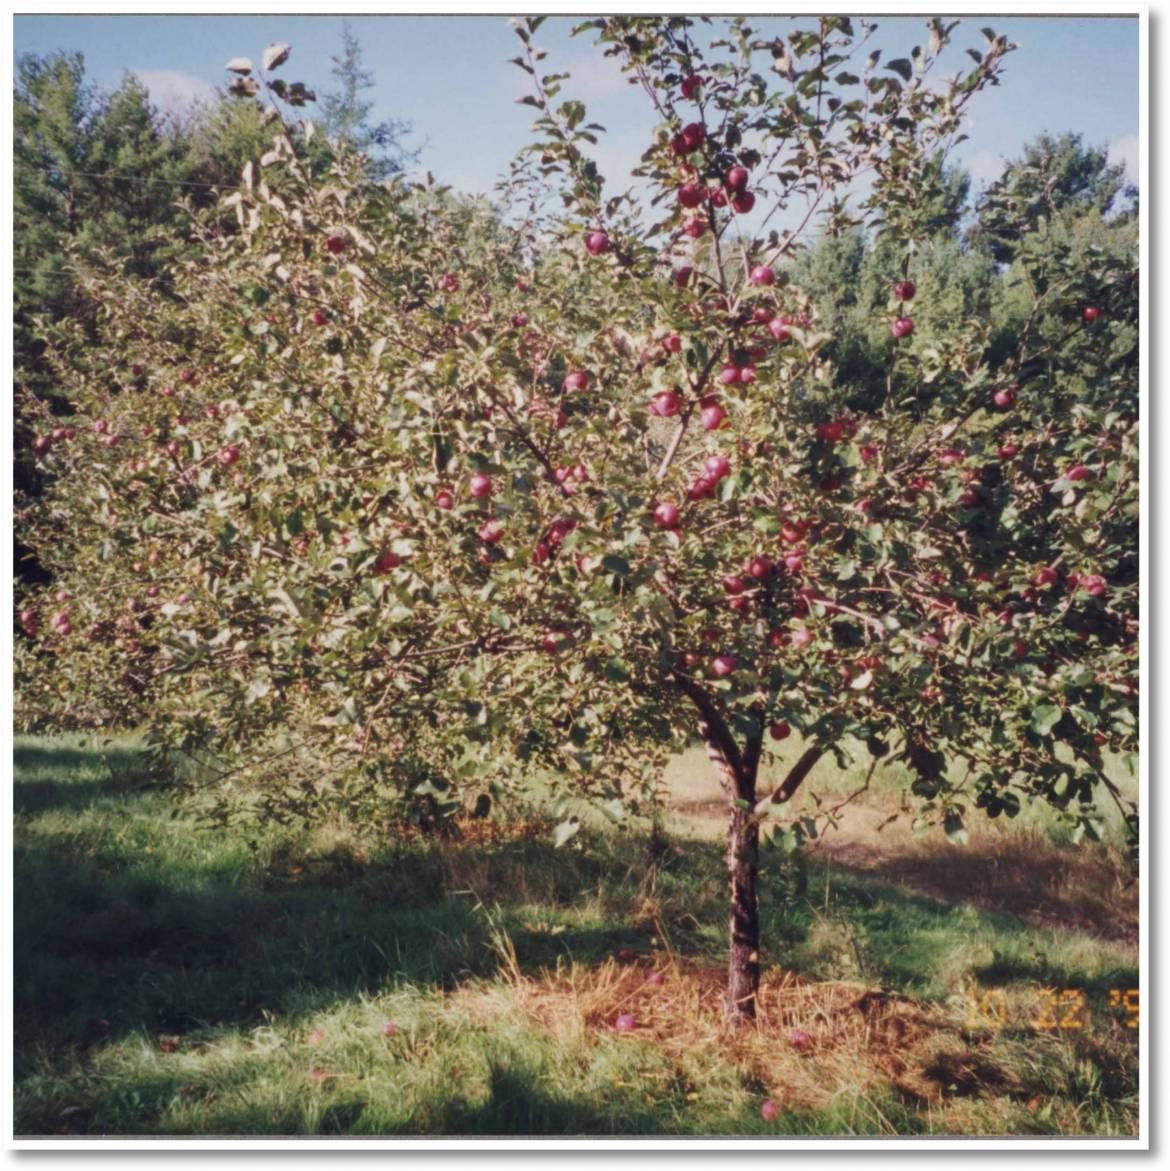 apples-in-abundance-scaled.jpg